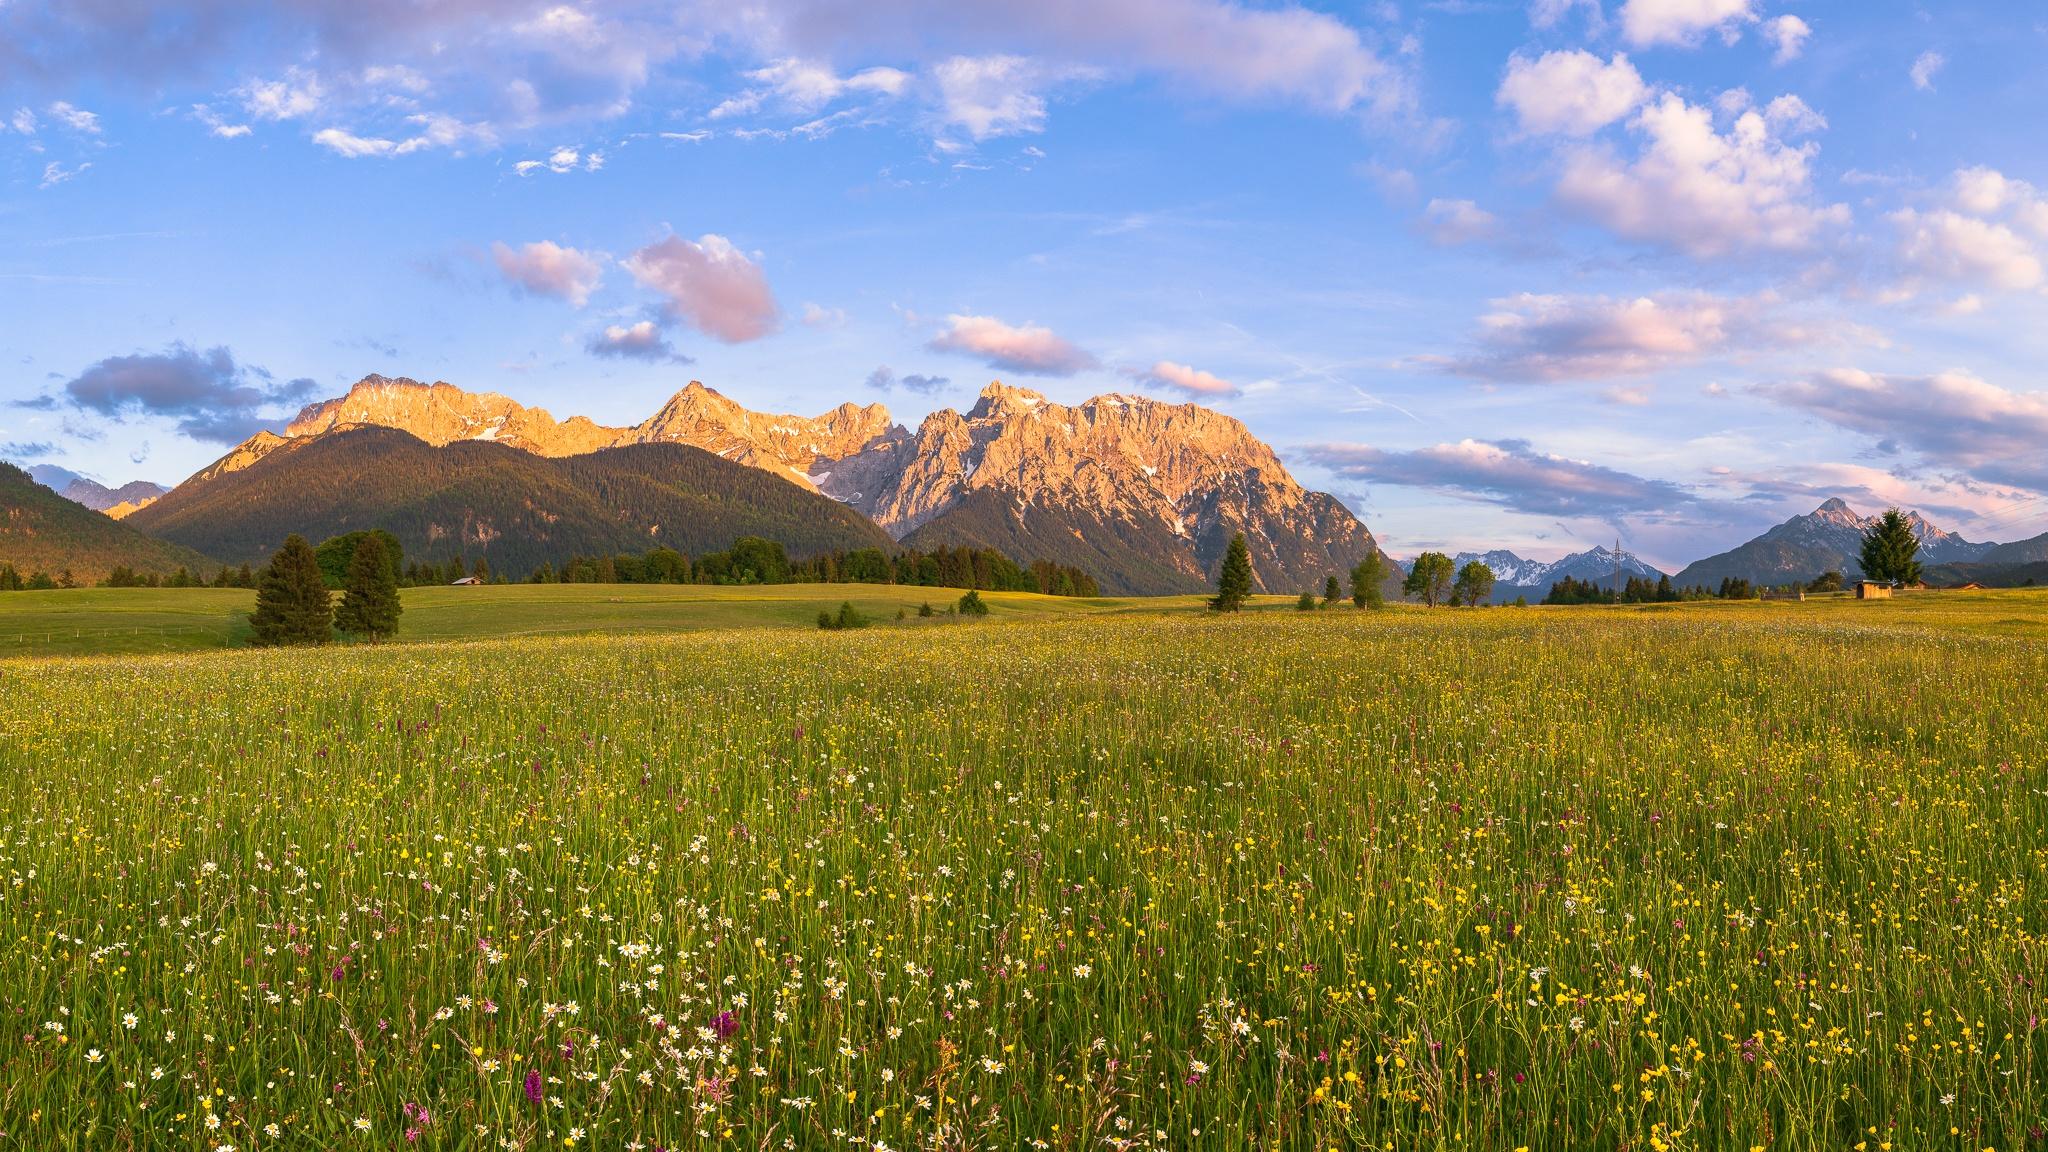 Sommerabend in der Alpenwelt Karwendel